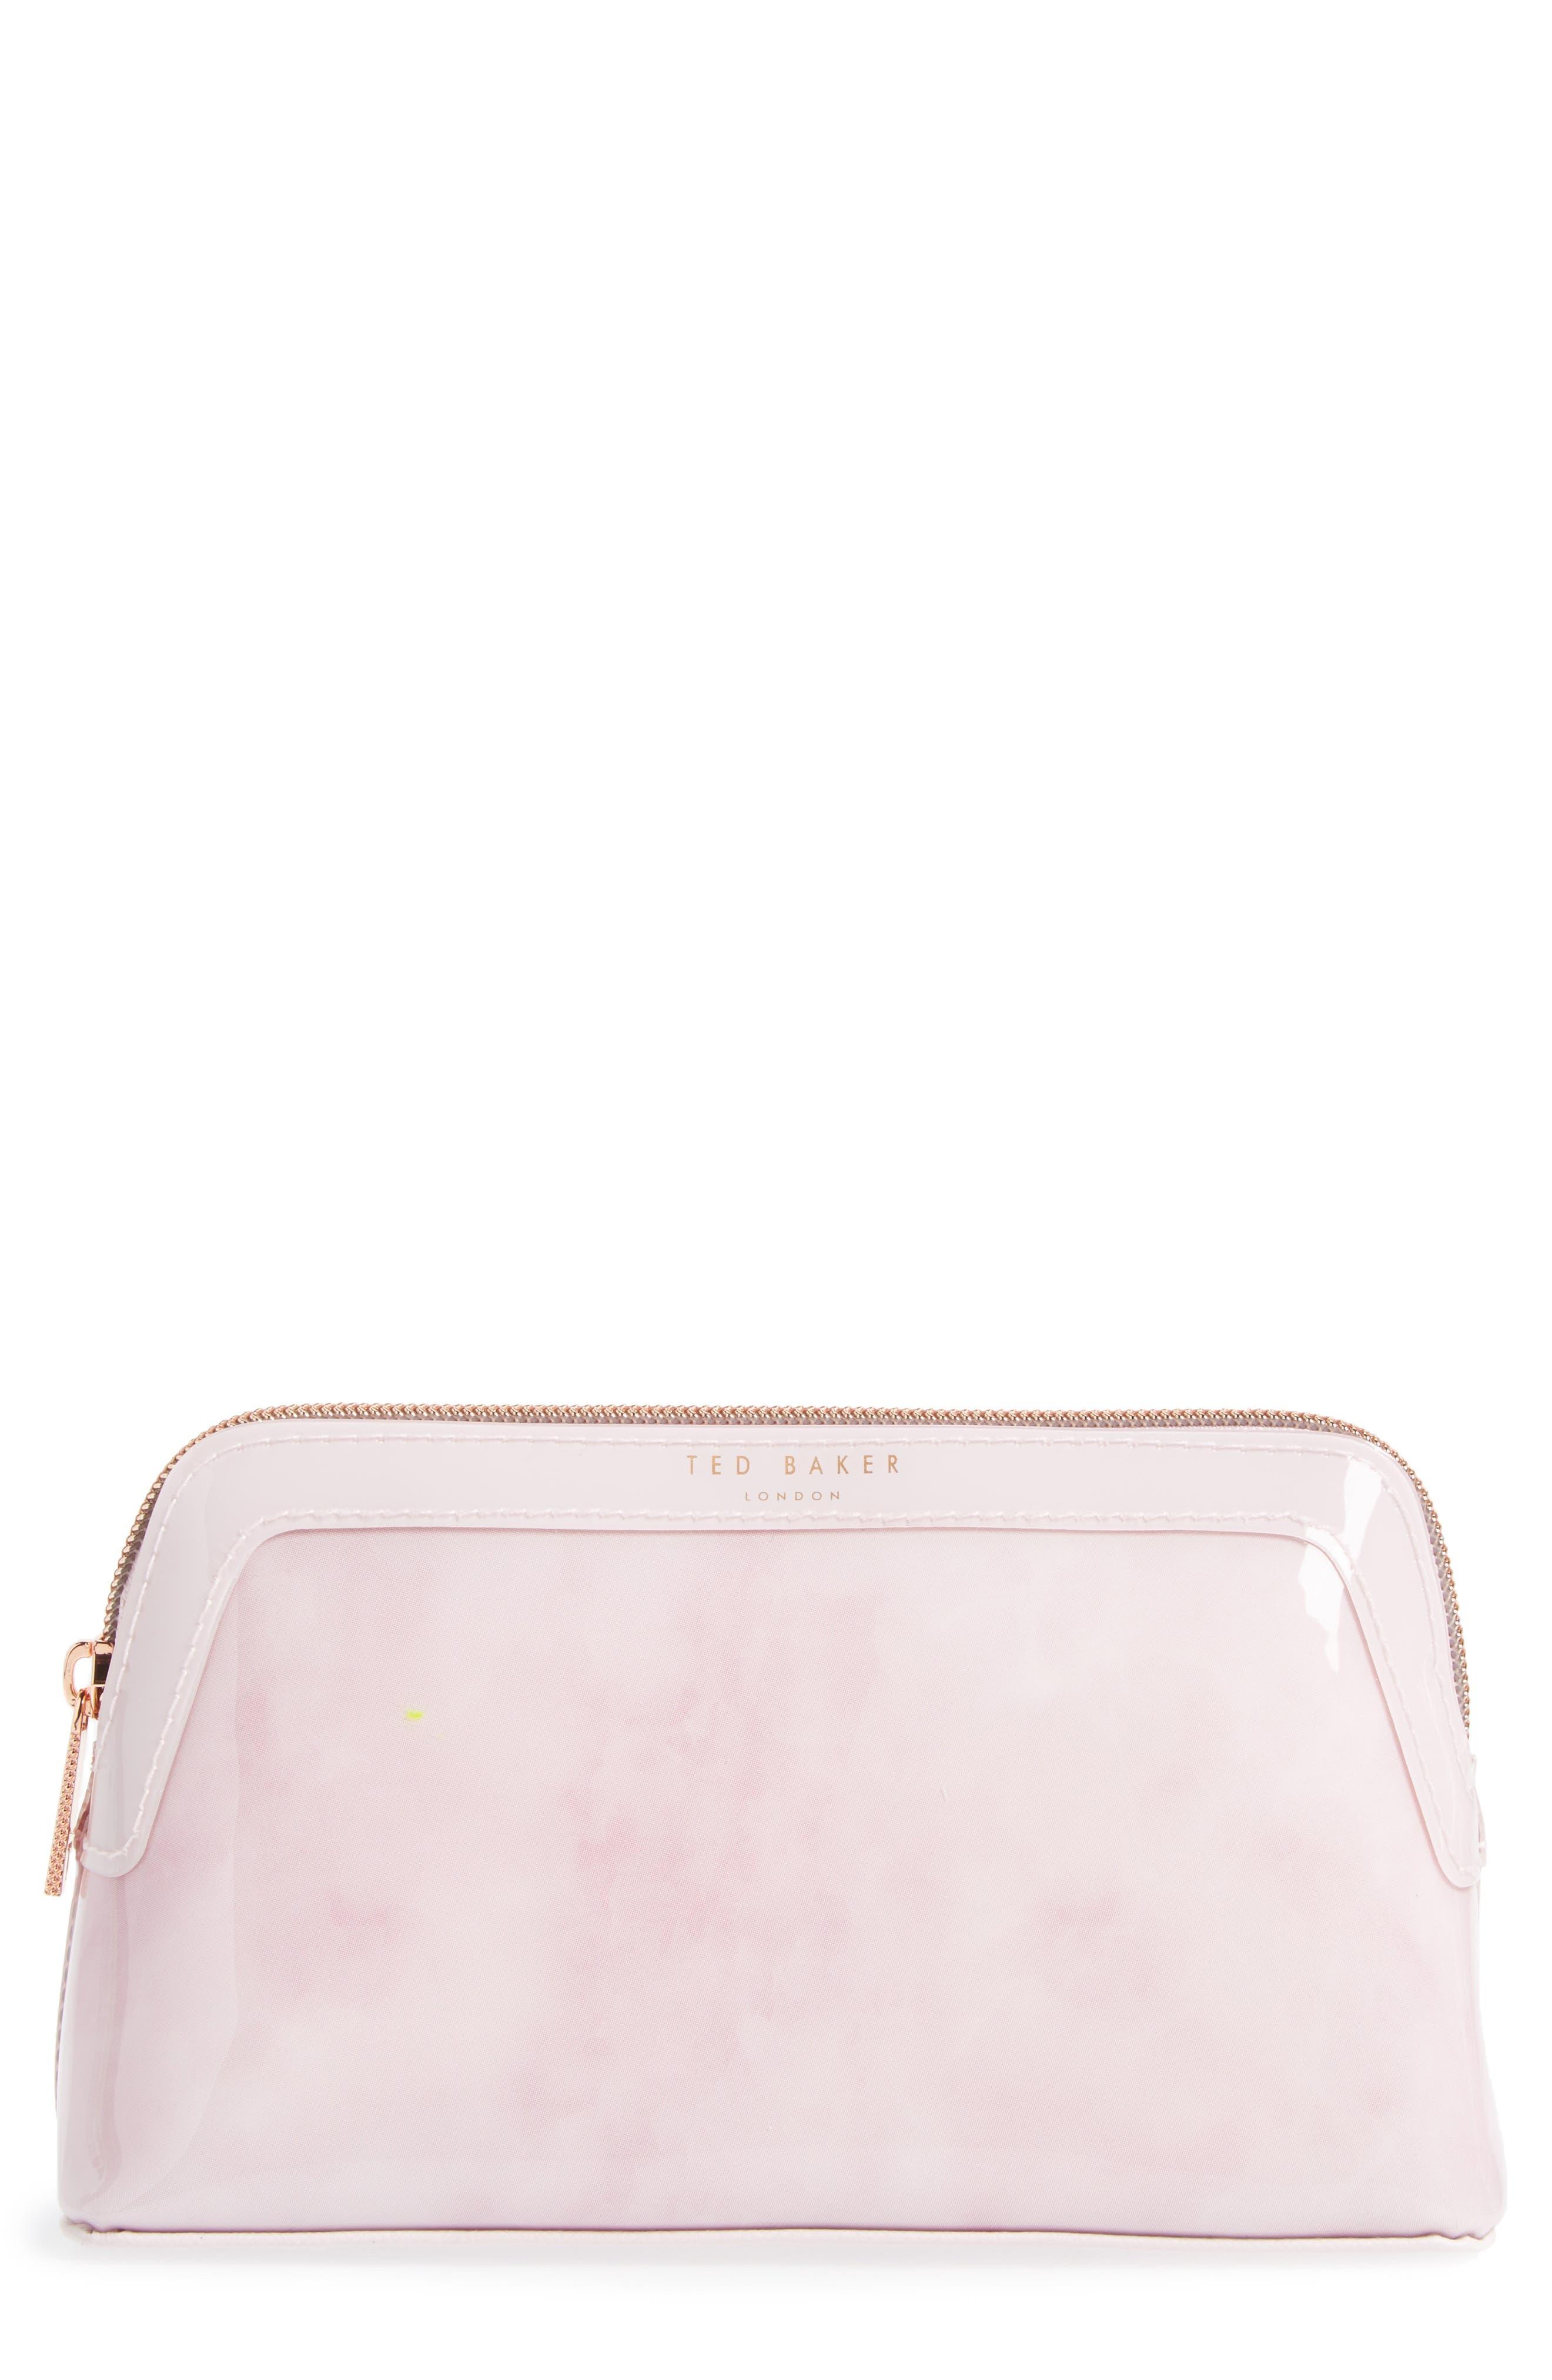 Ted Baker London Zandra - Rose Quartz Cosmetics Bag